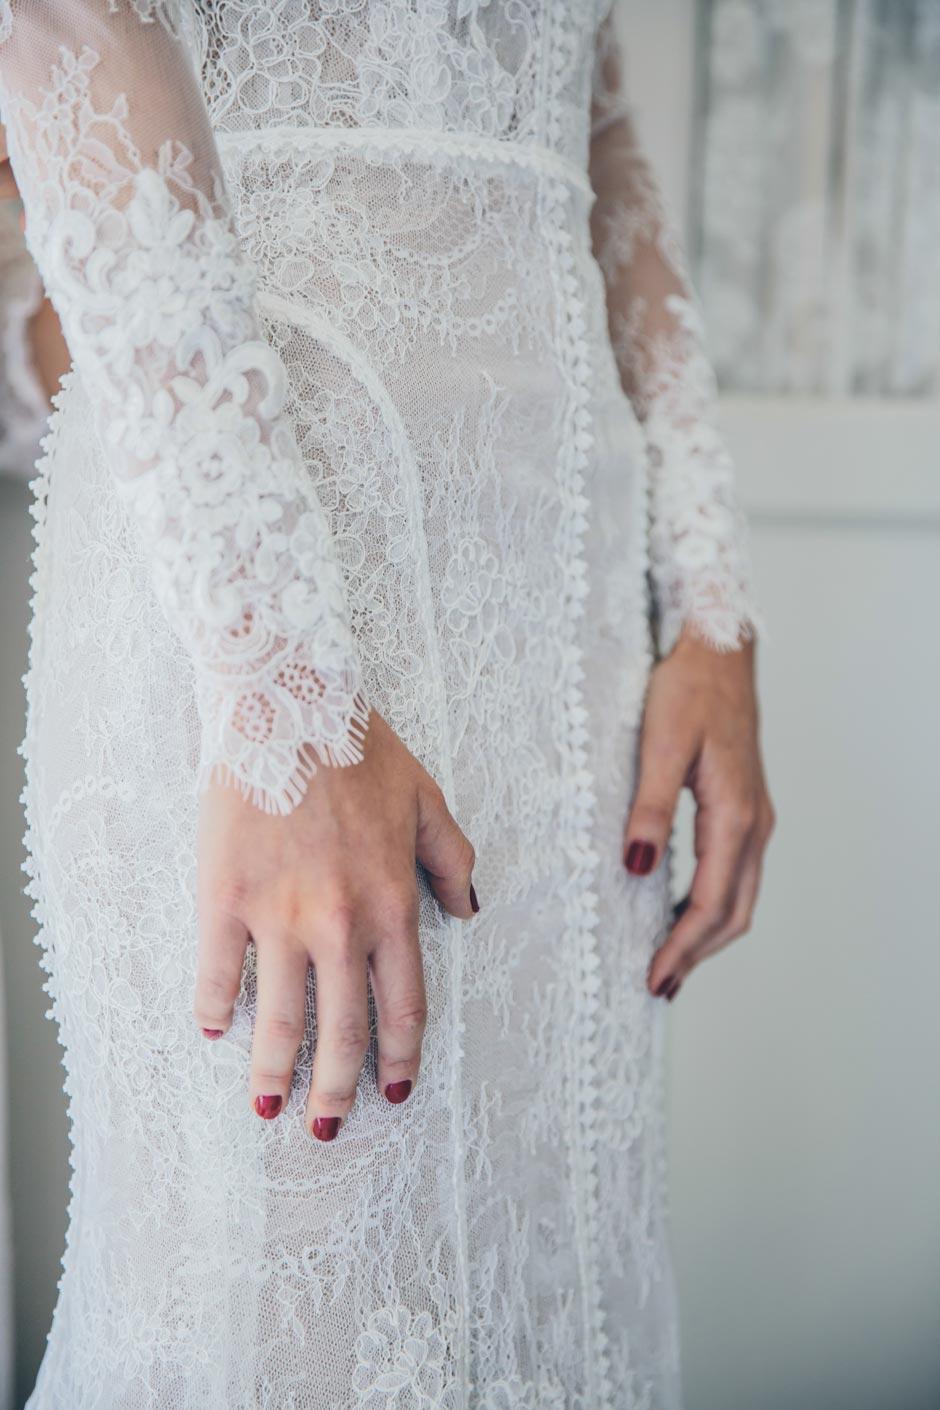 cape-town-wedding-south-africa-east-city-studio-shanna-jones-photography-raphaella-jedd-89